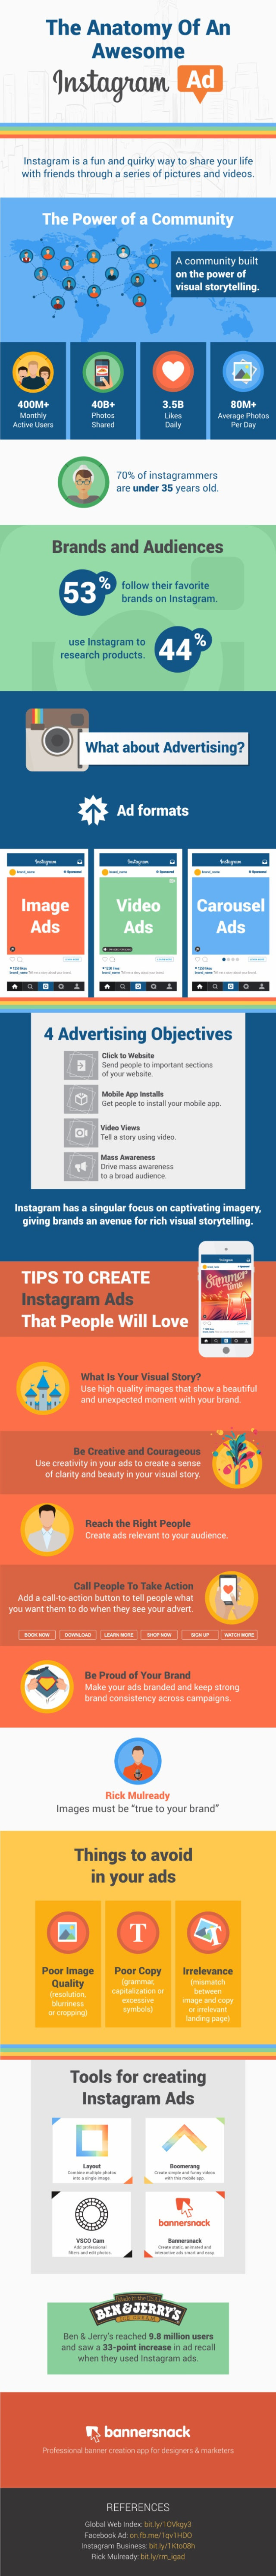 Advertising on #Instagram #SMM #Infographic